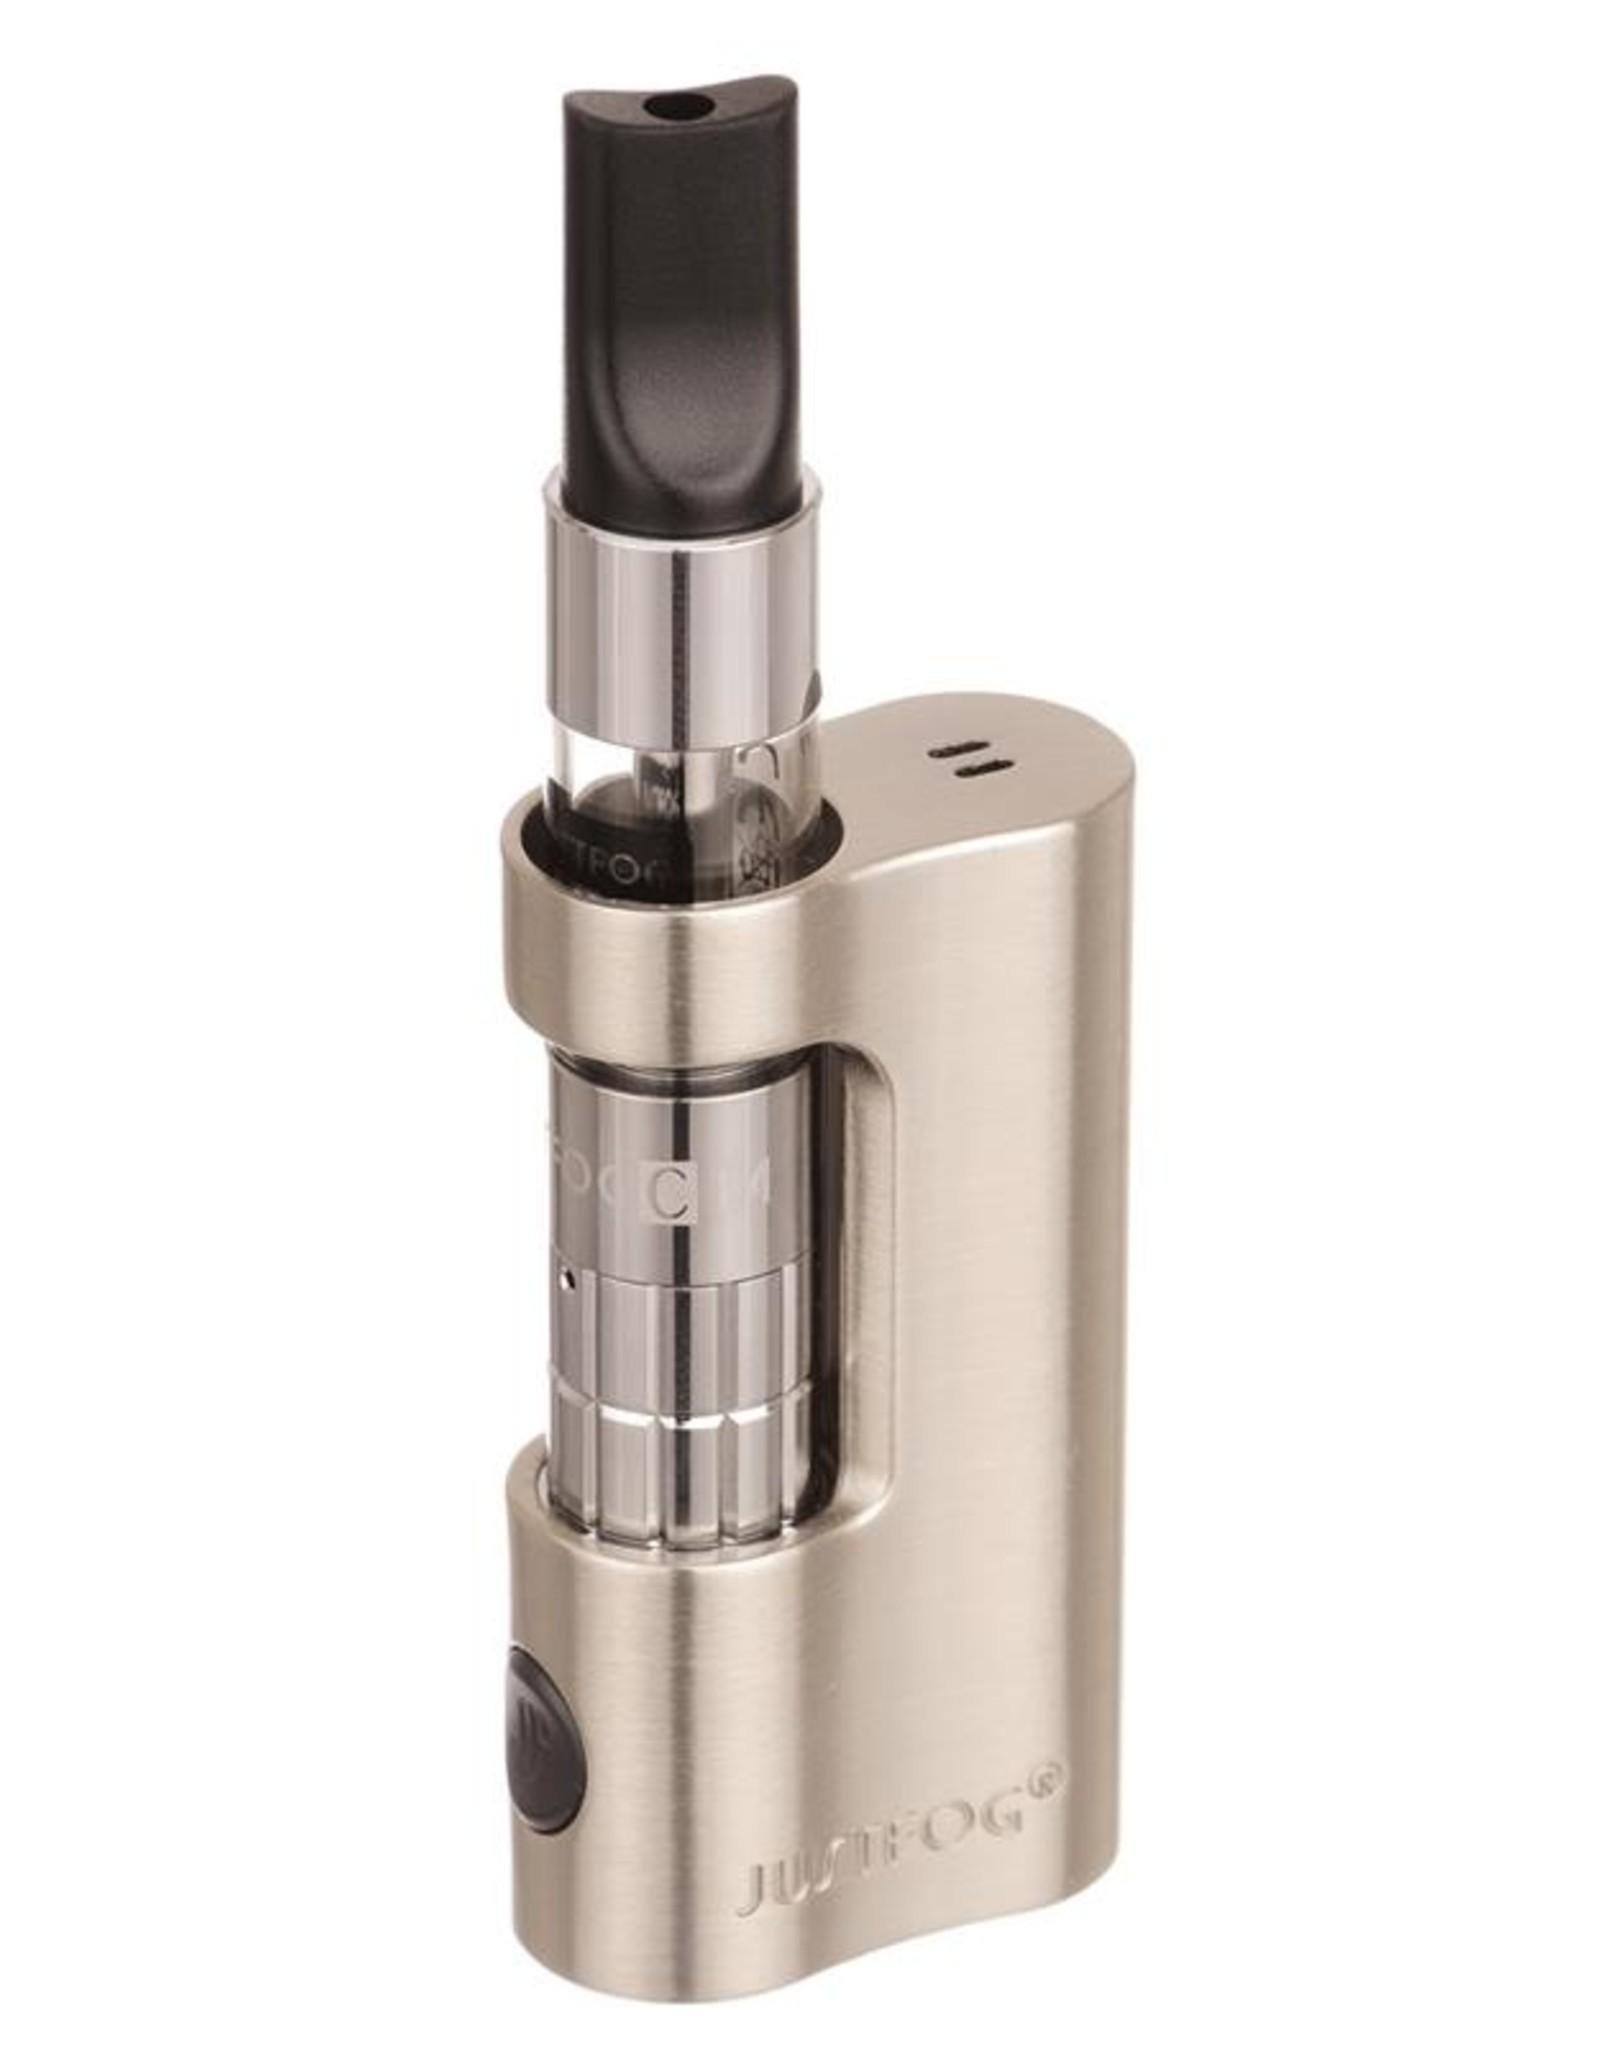 Justfog Justfog C14 Compact Kit Silver